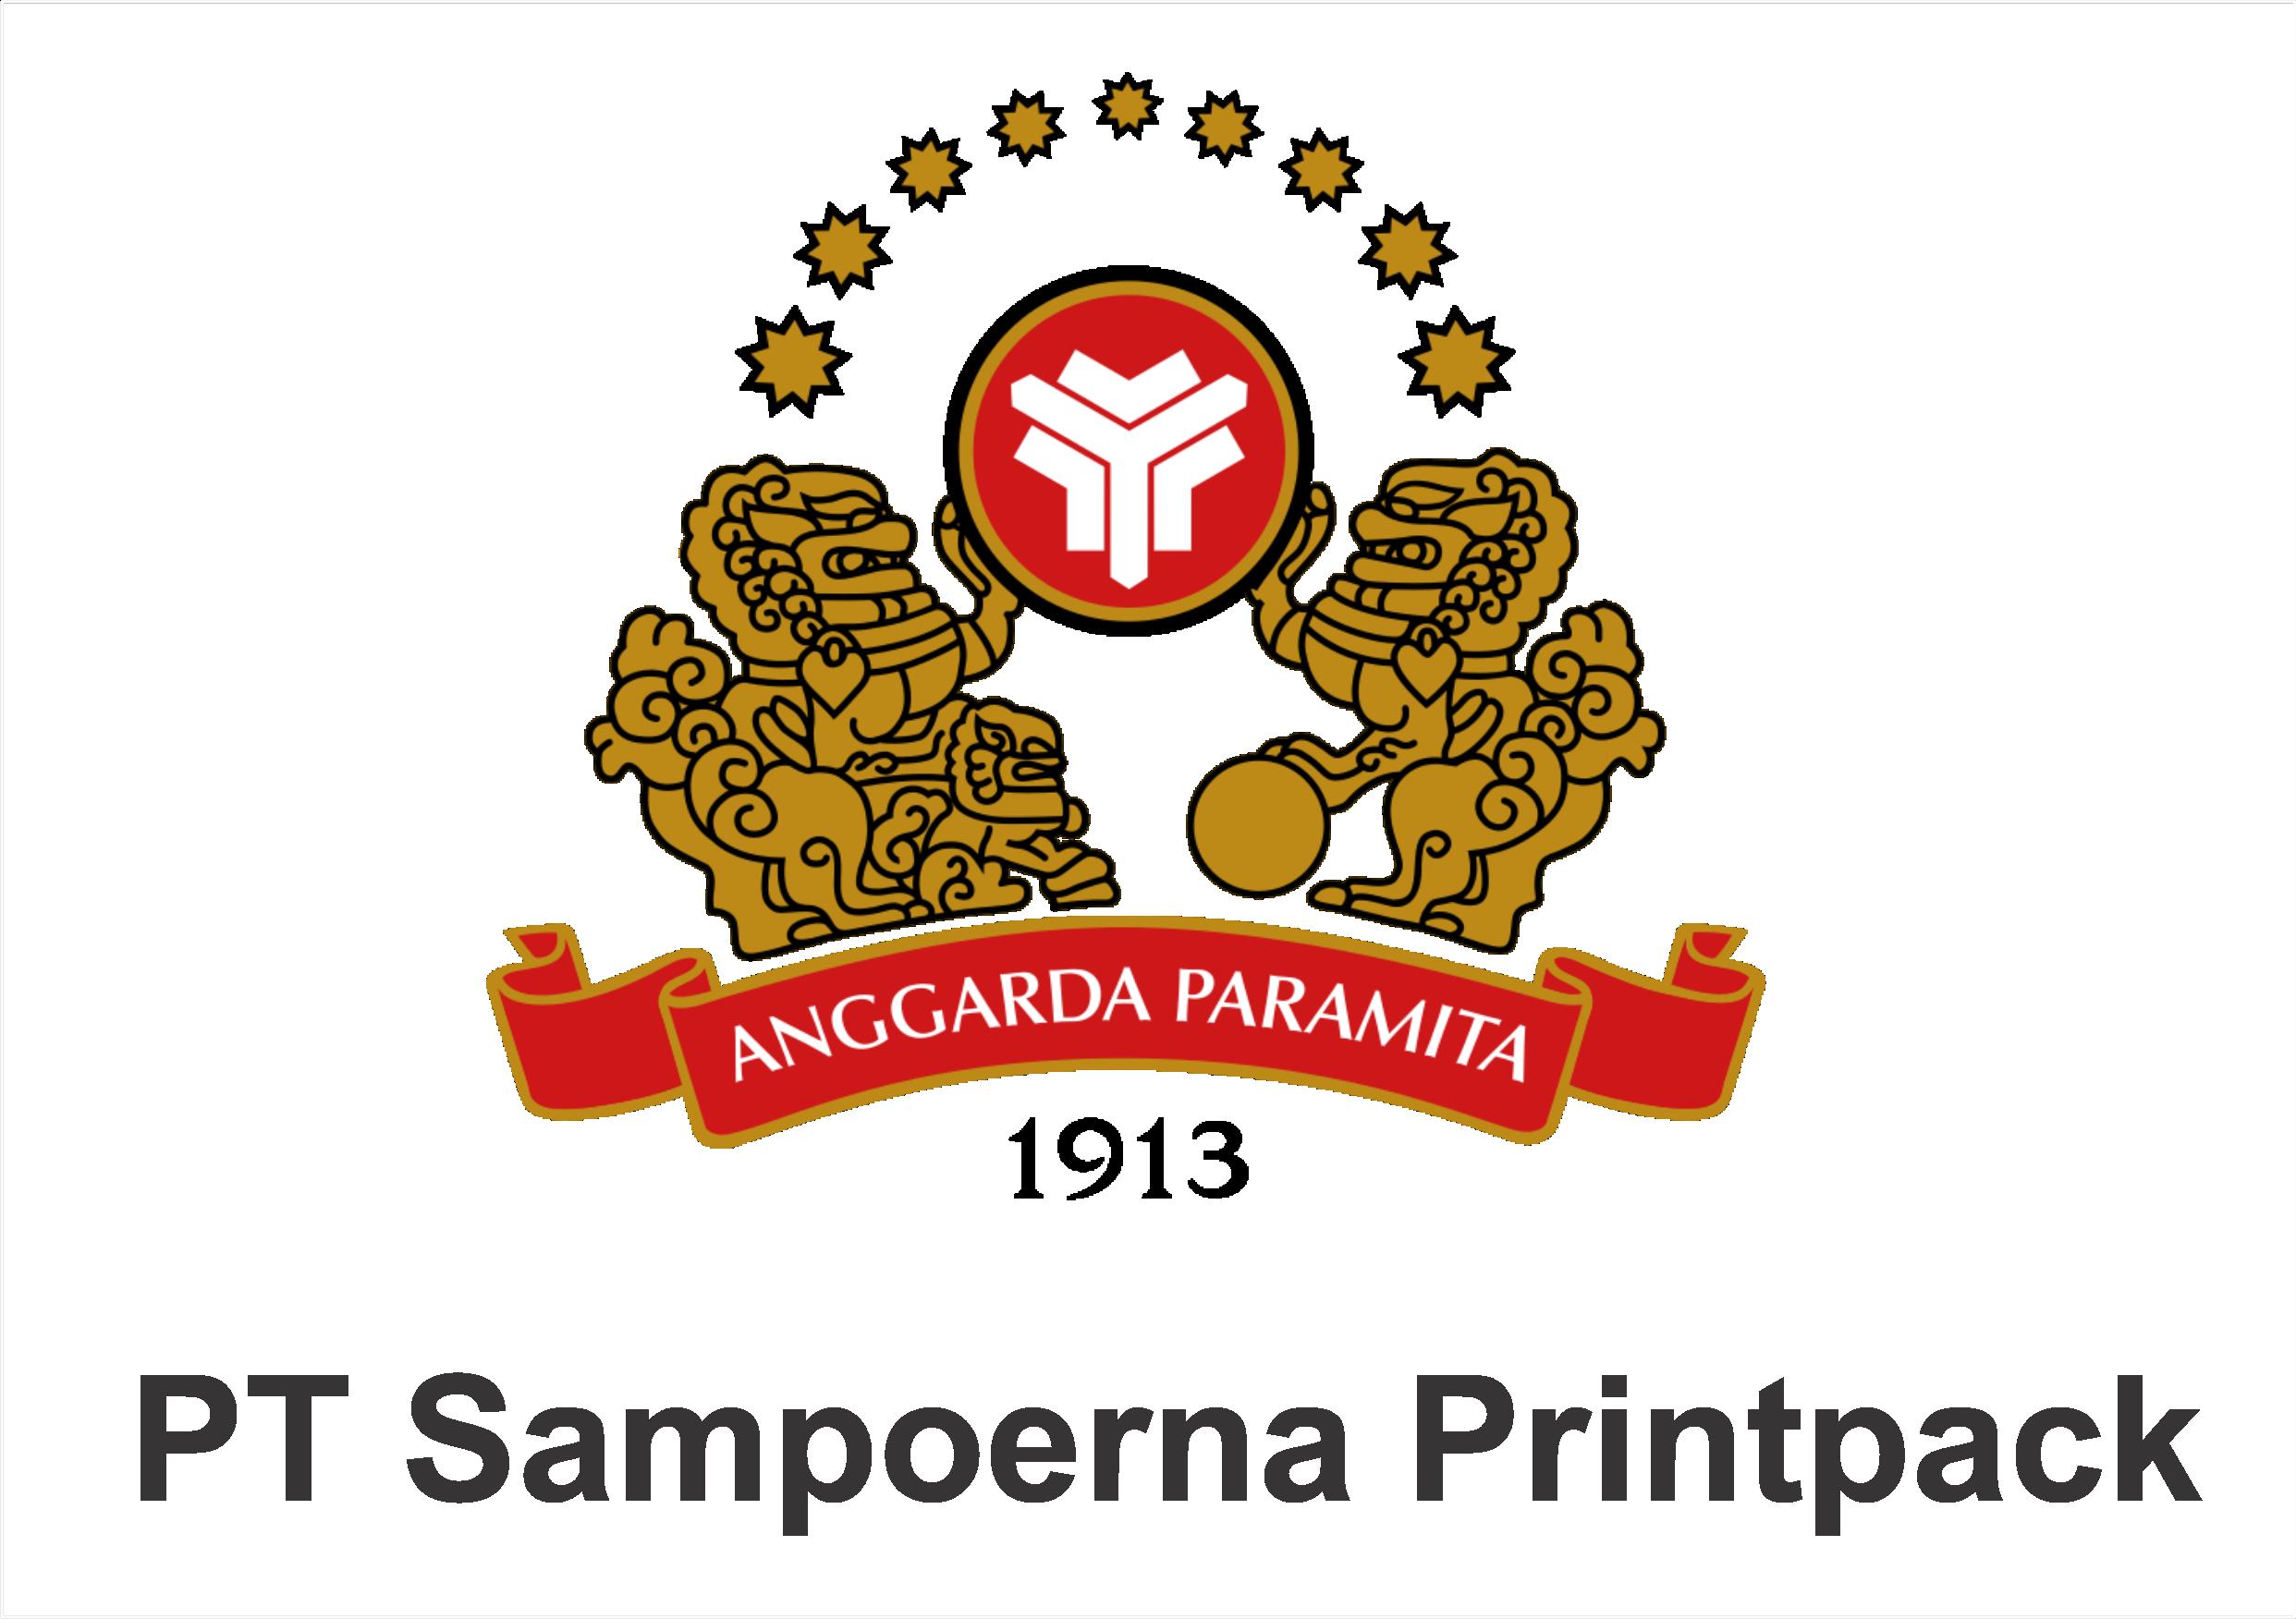 PT Sampoerna Printpack